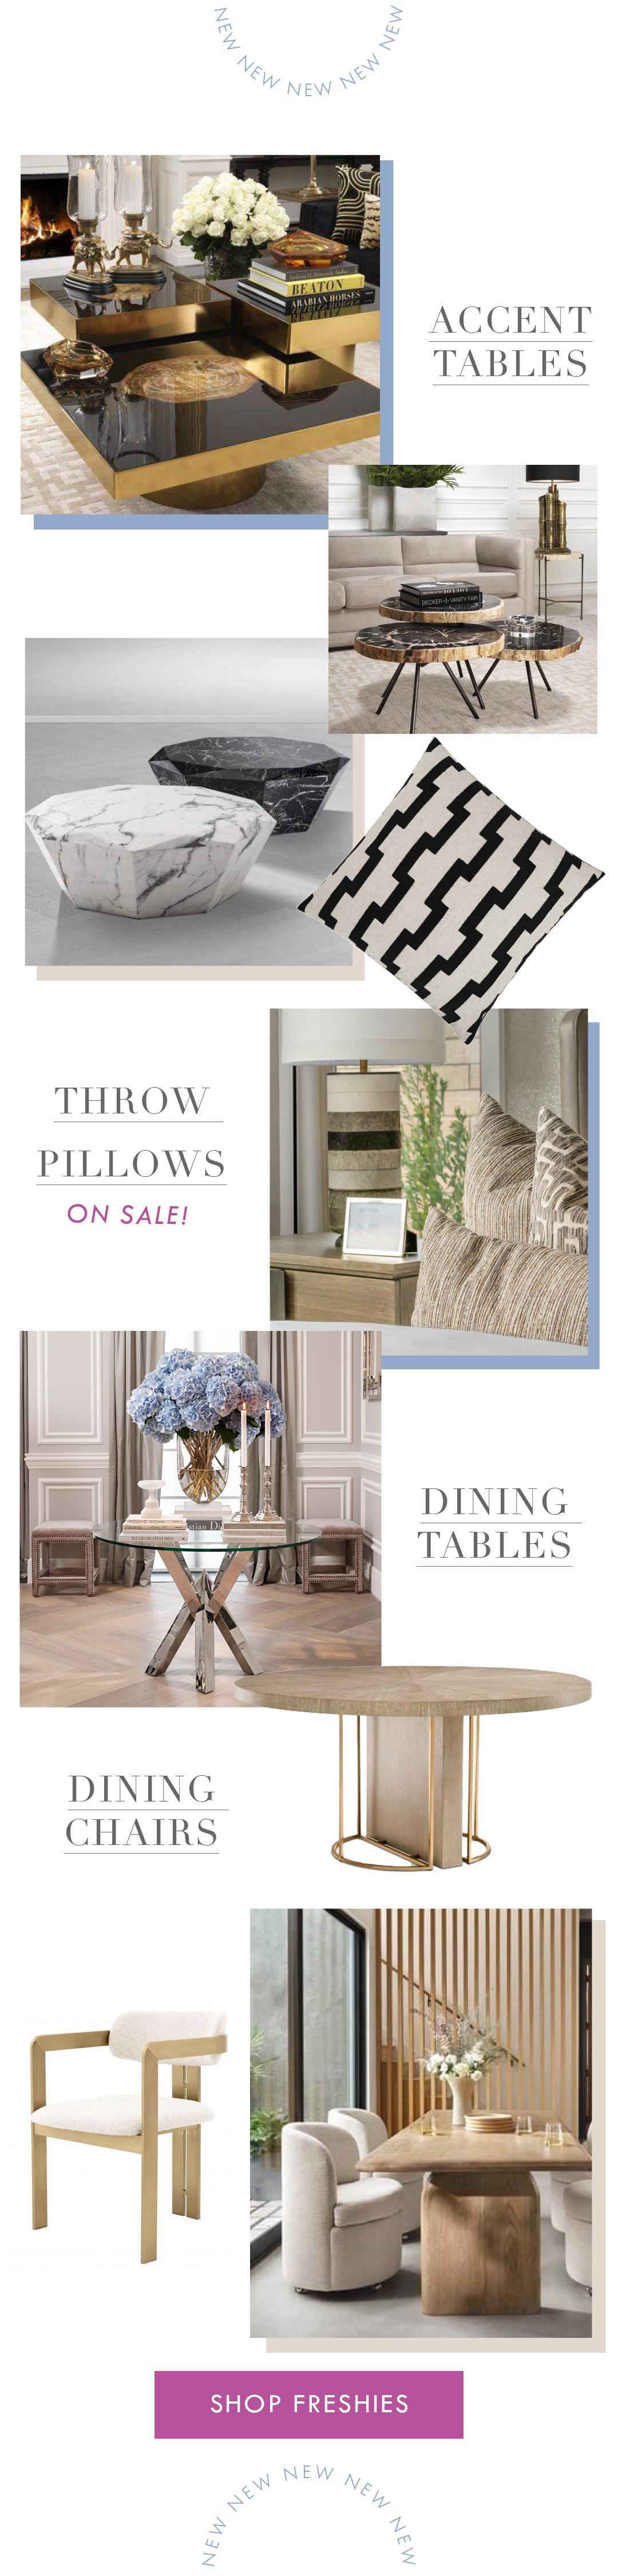 Shop Just In Furniture, Decor & Lighing